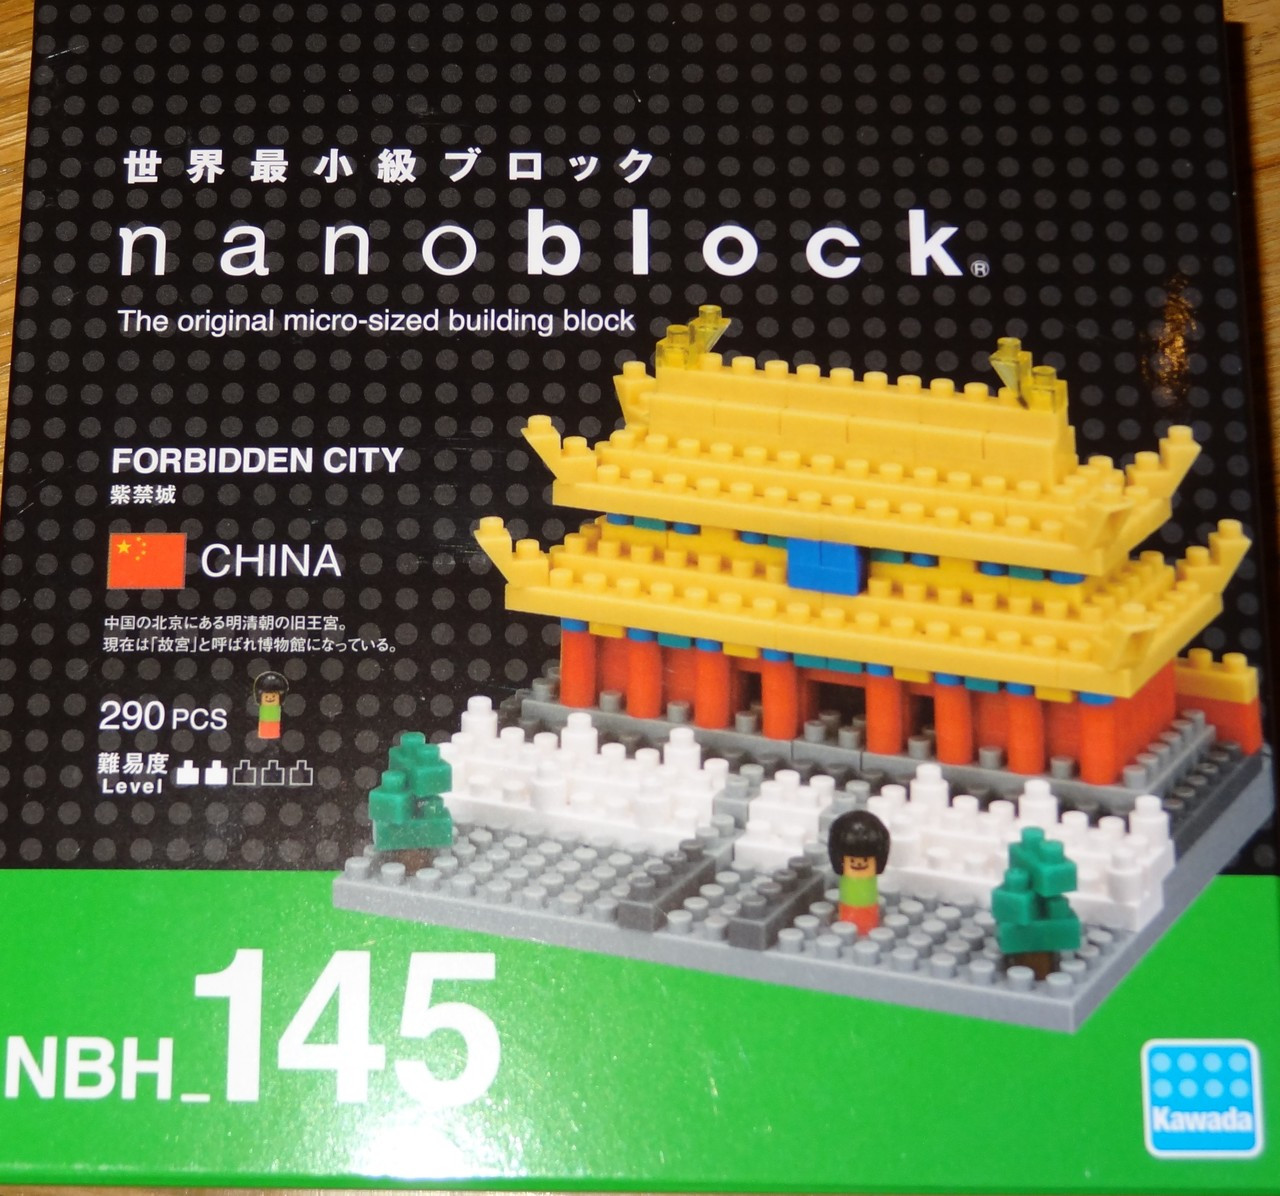 Forbidden City Nanoblock